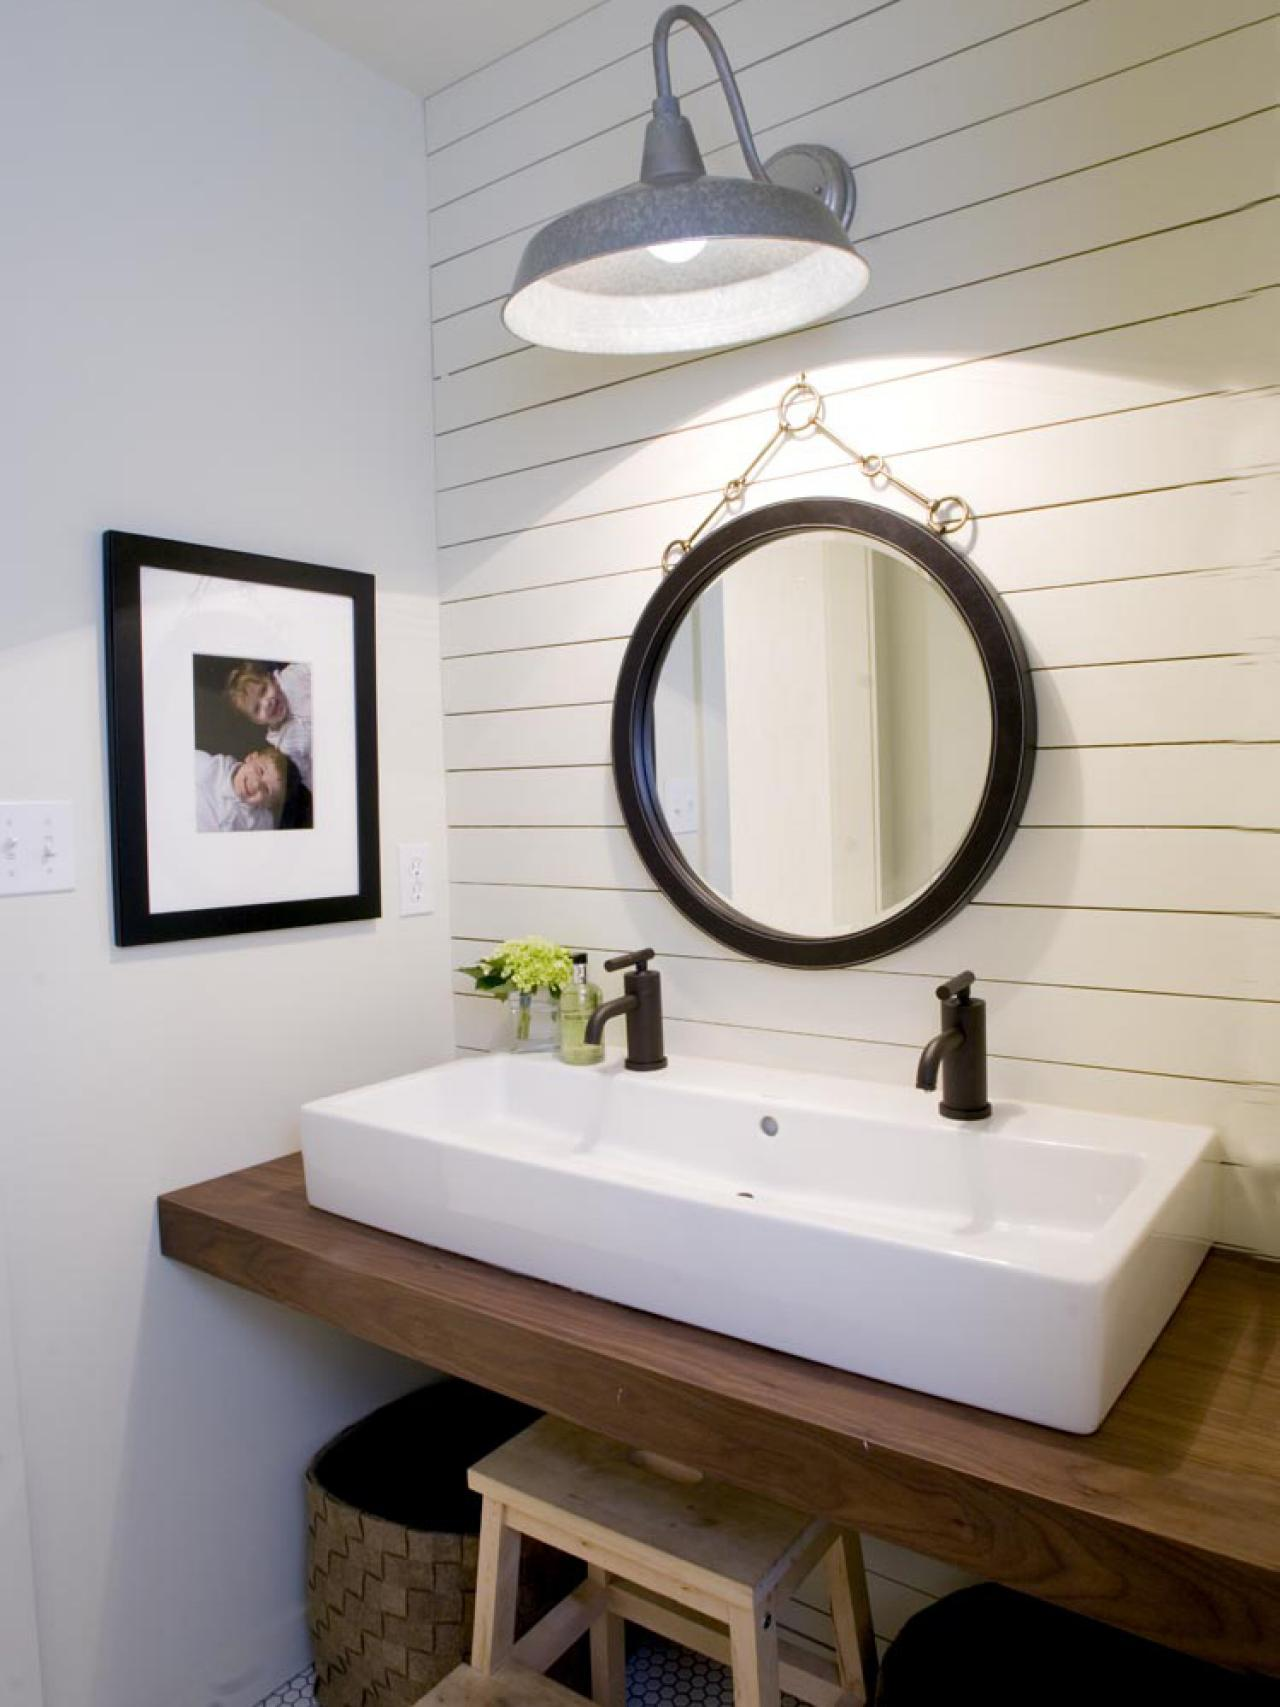 RMS-dwanderson_modern-farmhouse-bathroom_s3x4.jpg.rend.hgtvcom.1280.1707